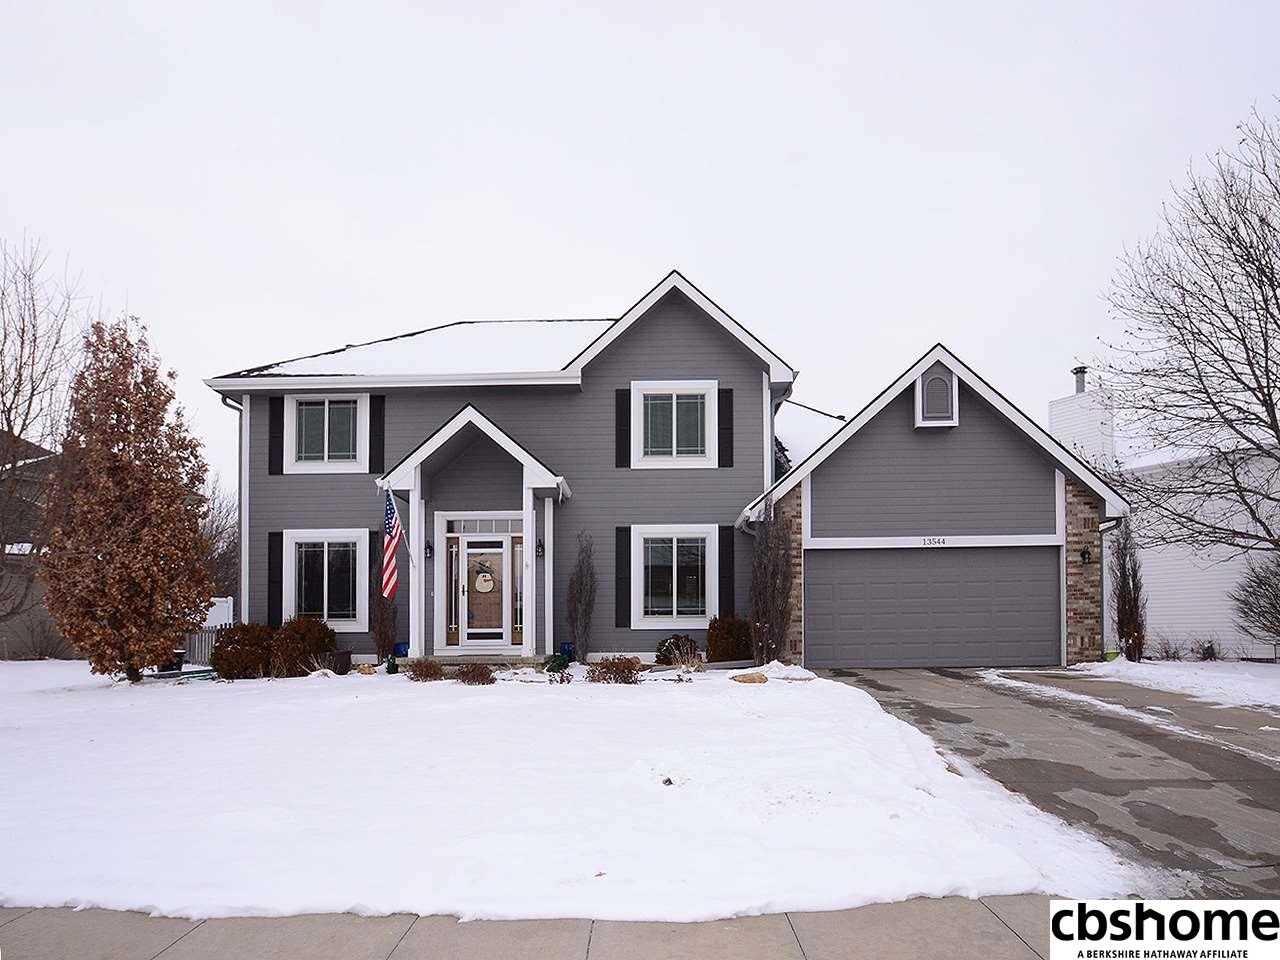 13544 Sahler Omaha, NE 68164 | MLS 21801875 Photo 1